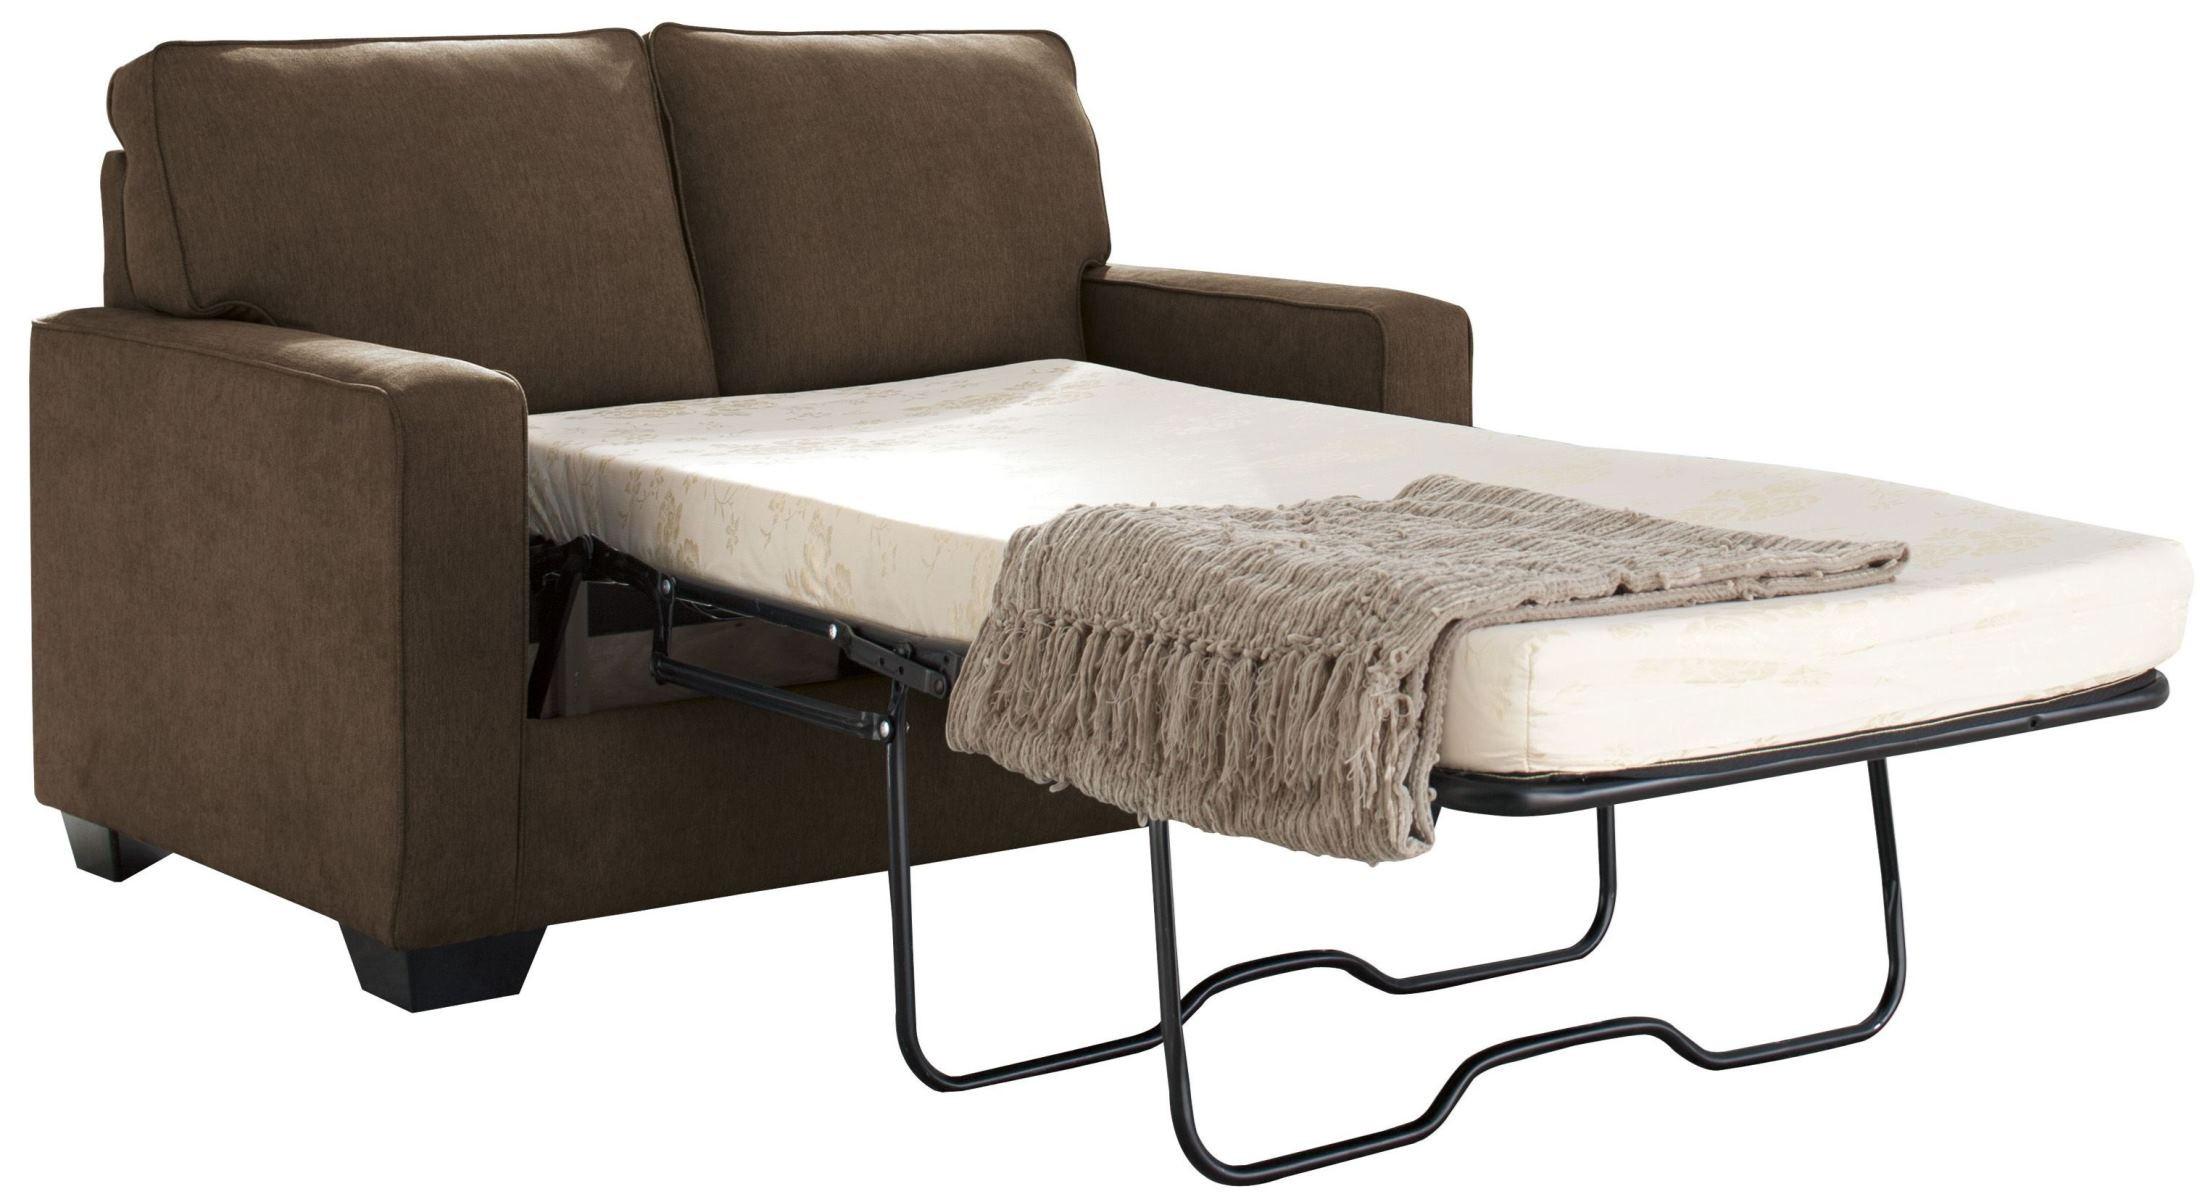 Zeb Espresso Twin Sofa Sleeper From Ashley Coleman Furniture